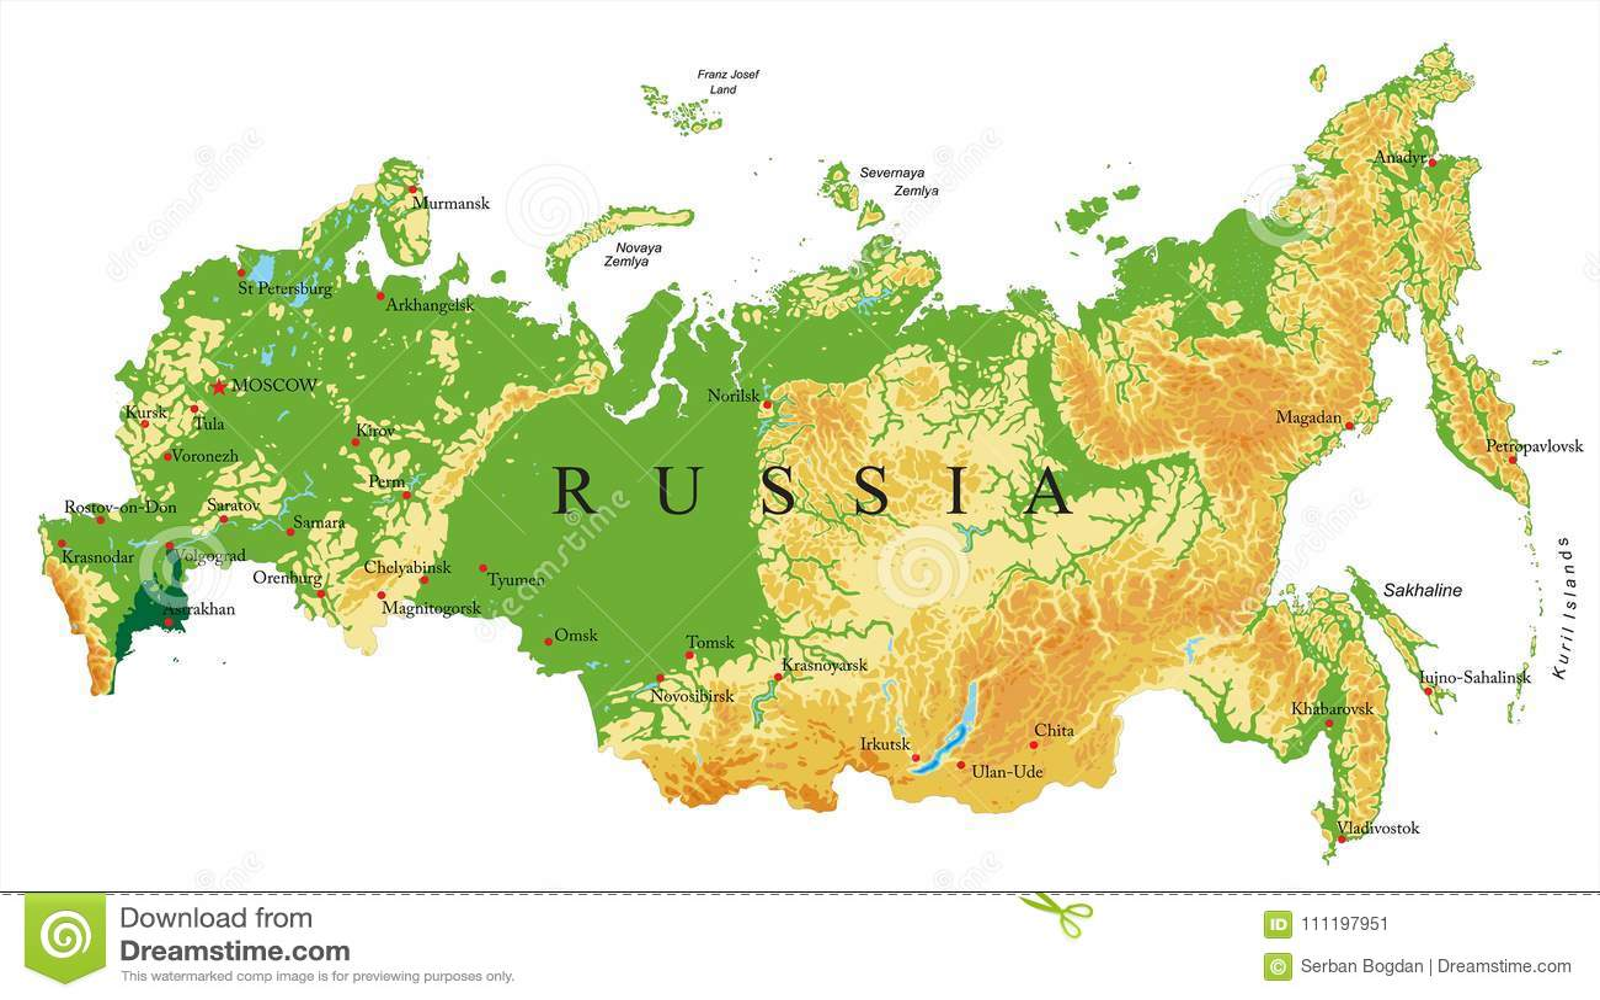 Russia Relief Map Stock Vector Illustration Of Krai